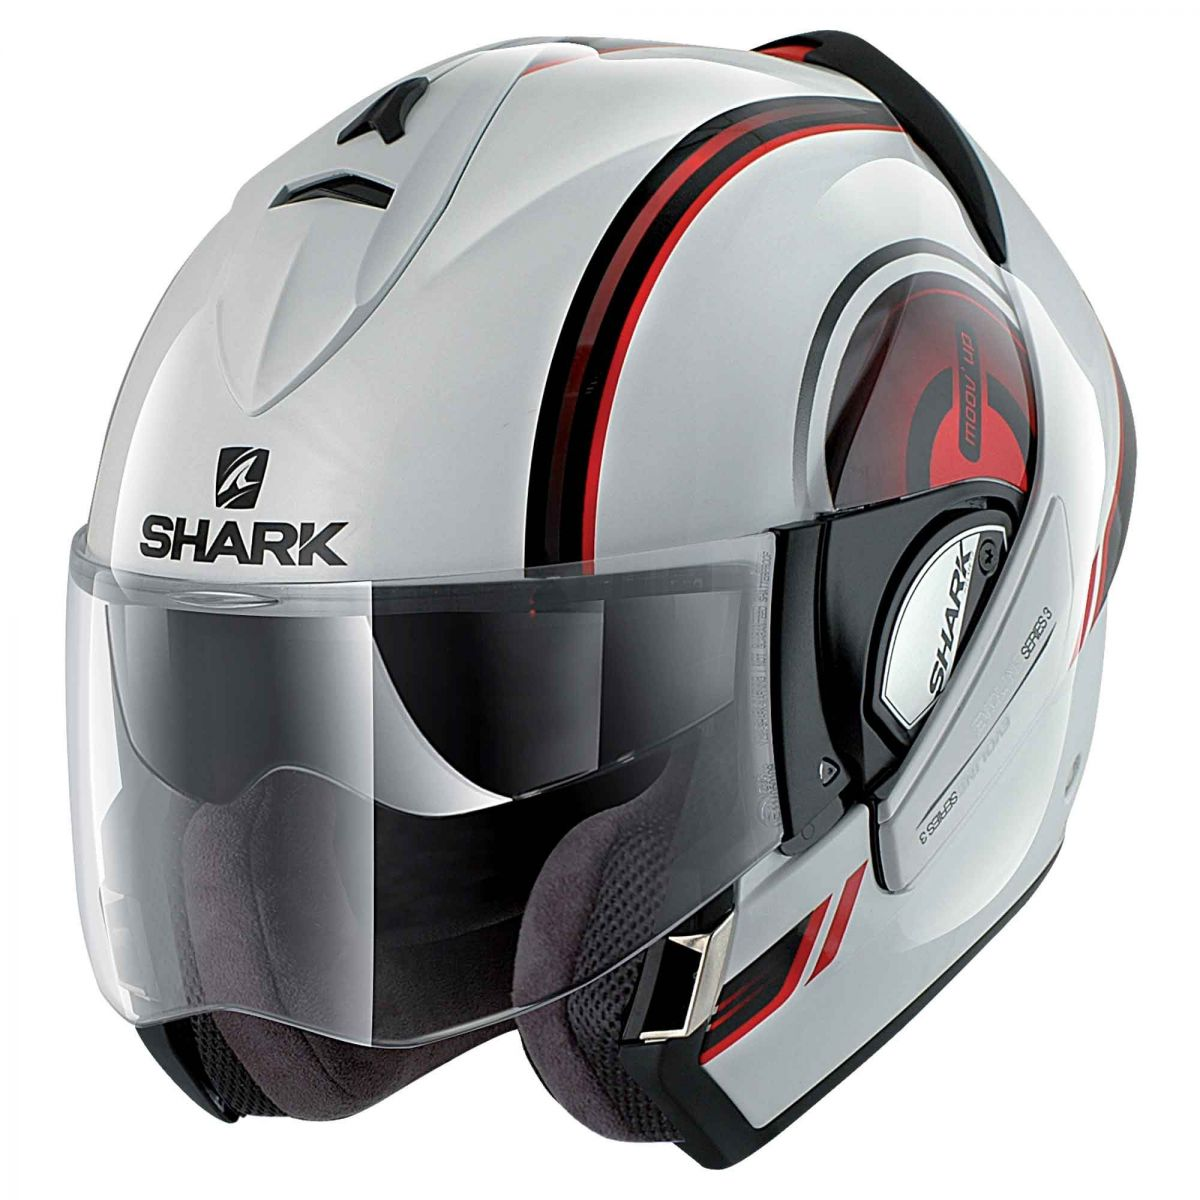 Capacete Shark Evoline Serie 3 Moov Up WKR Escamoteável - Branco c/ Vermelho  - Super Bike - Loja Oficial Alpinestars